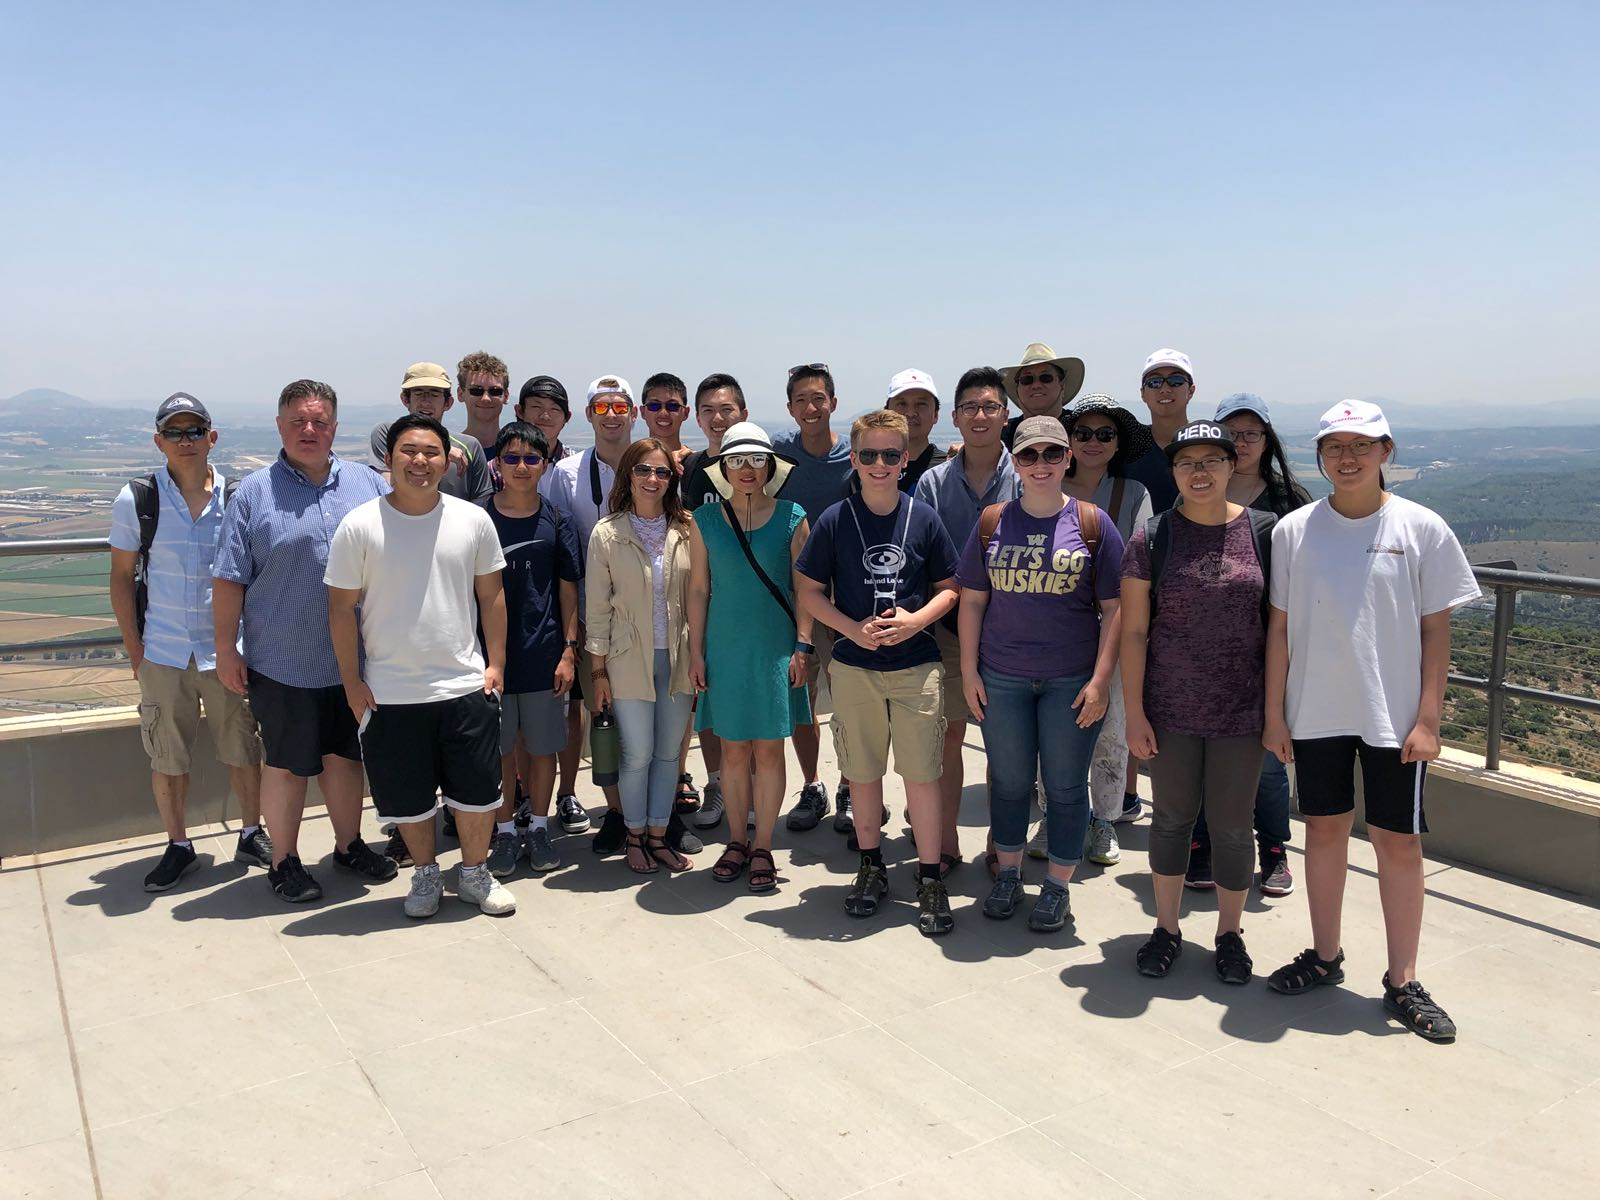 2018 New Generation Israel Pilgrimage Tour